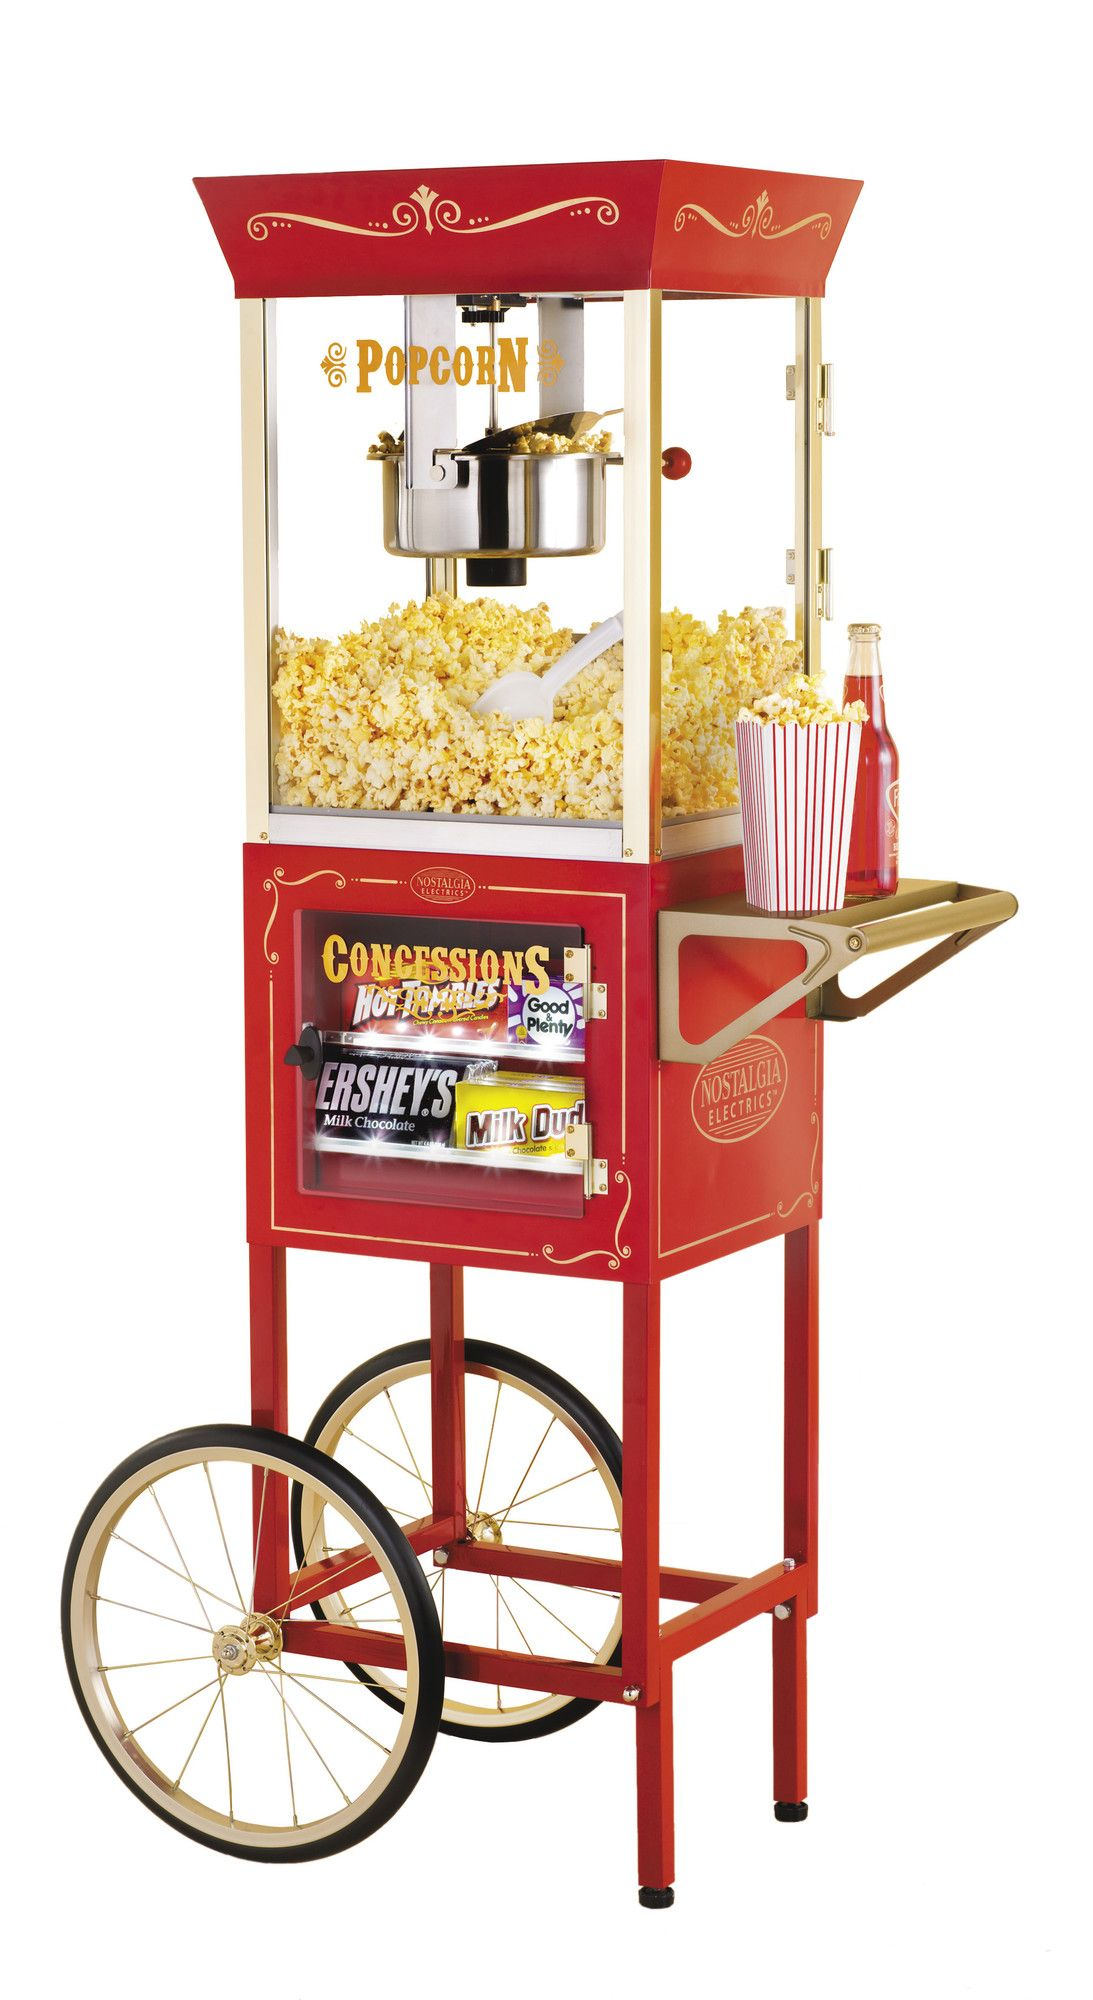 Nostalgia Electrics Vintage 6 Ounce Popcorn and Concession Cart | Wayfair